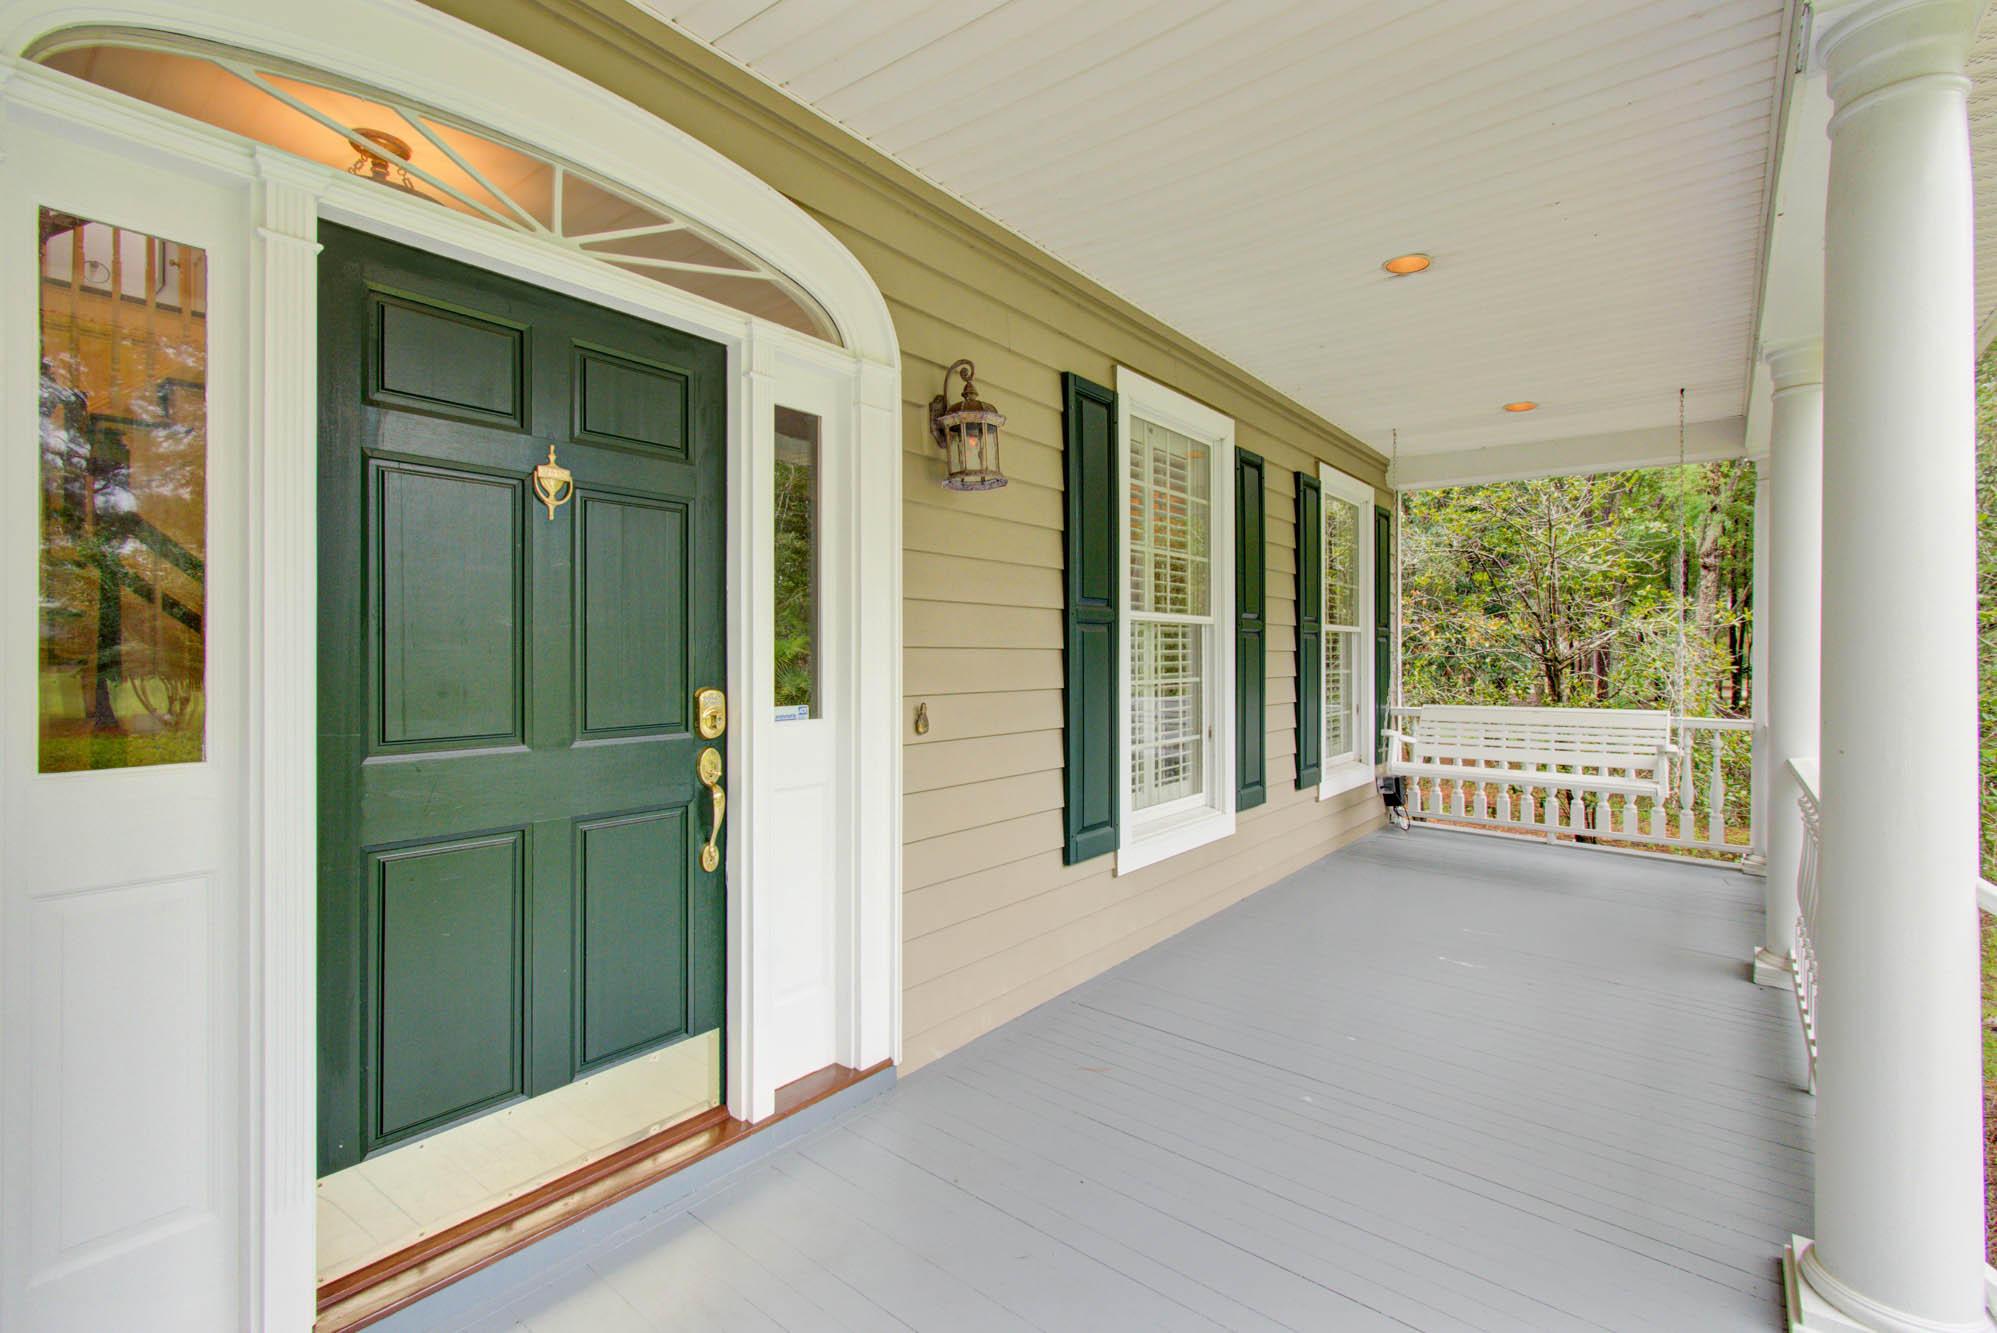 Dunes West Homes For Sale - 3515 Colonel Vanderhorst, Mount Pleasant, SC - 35